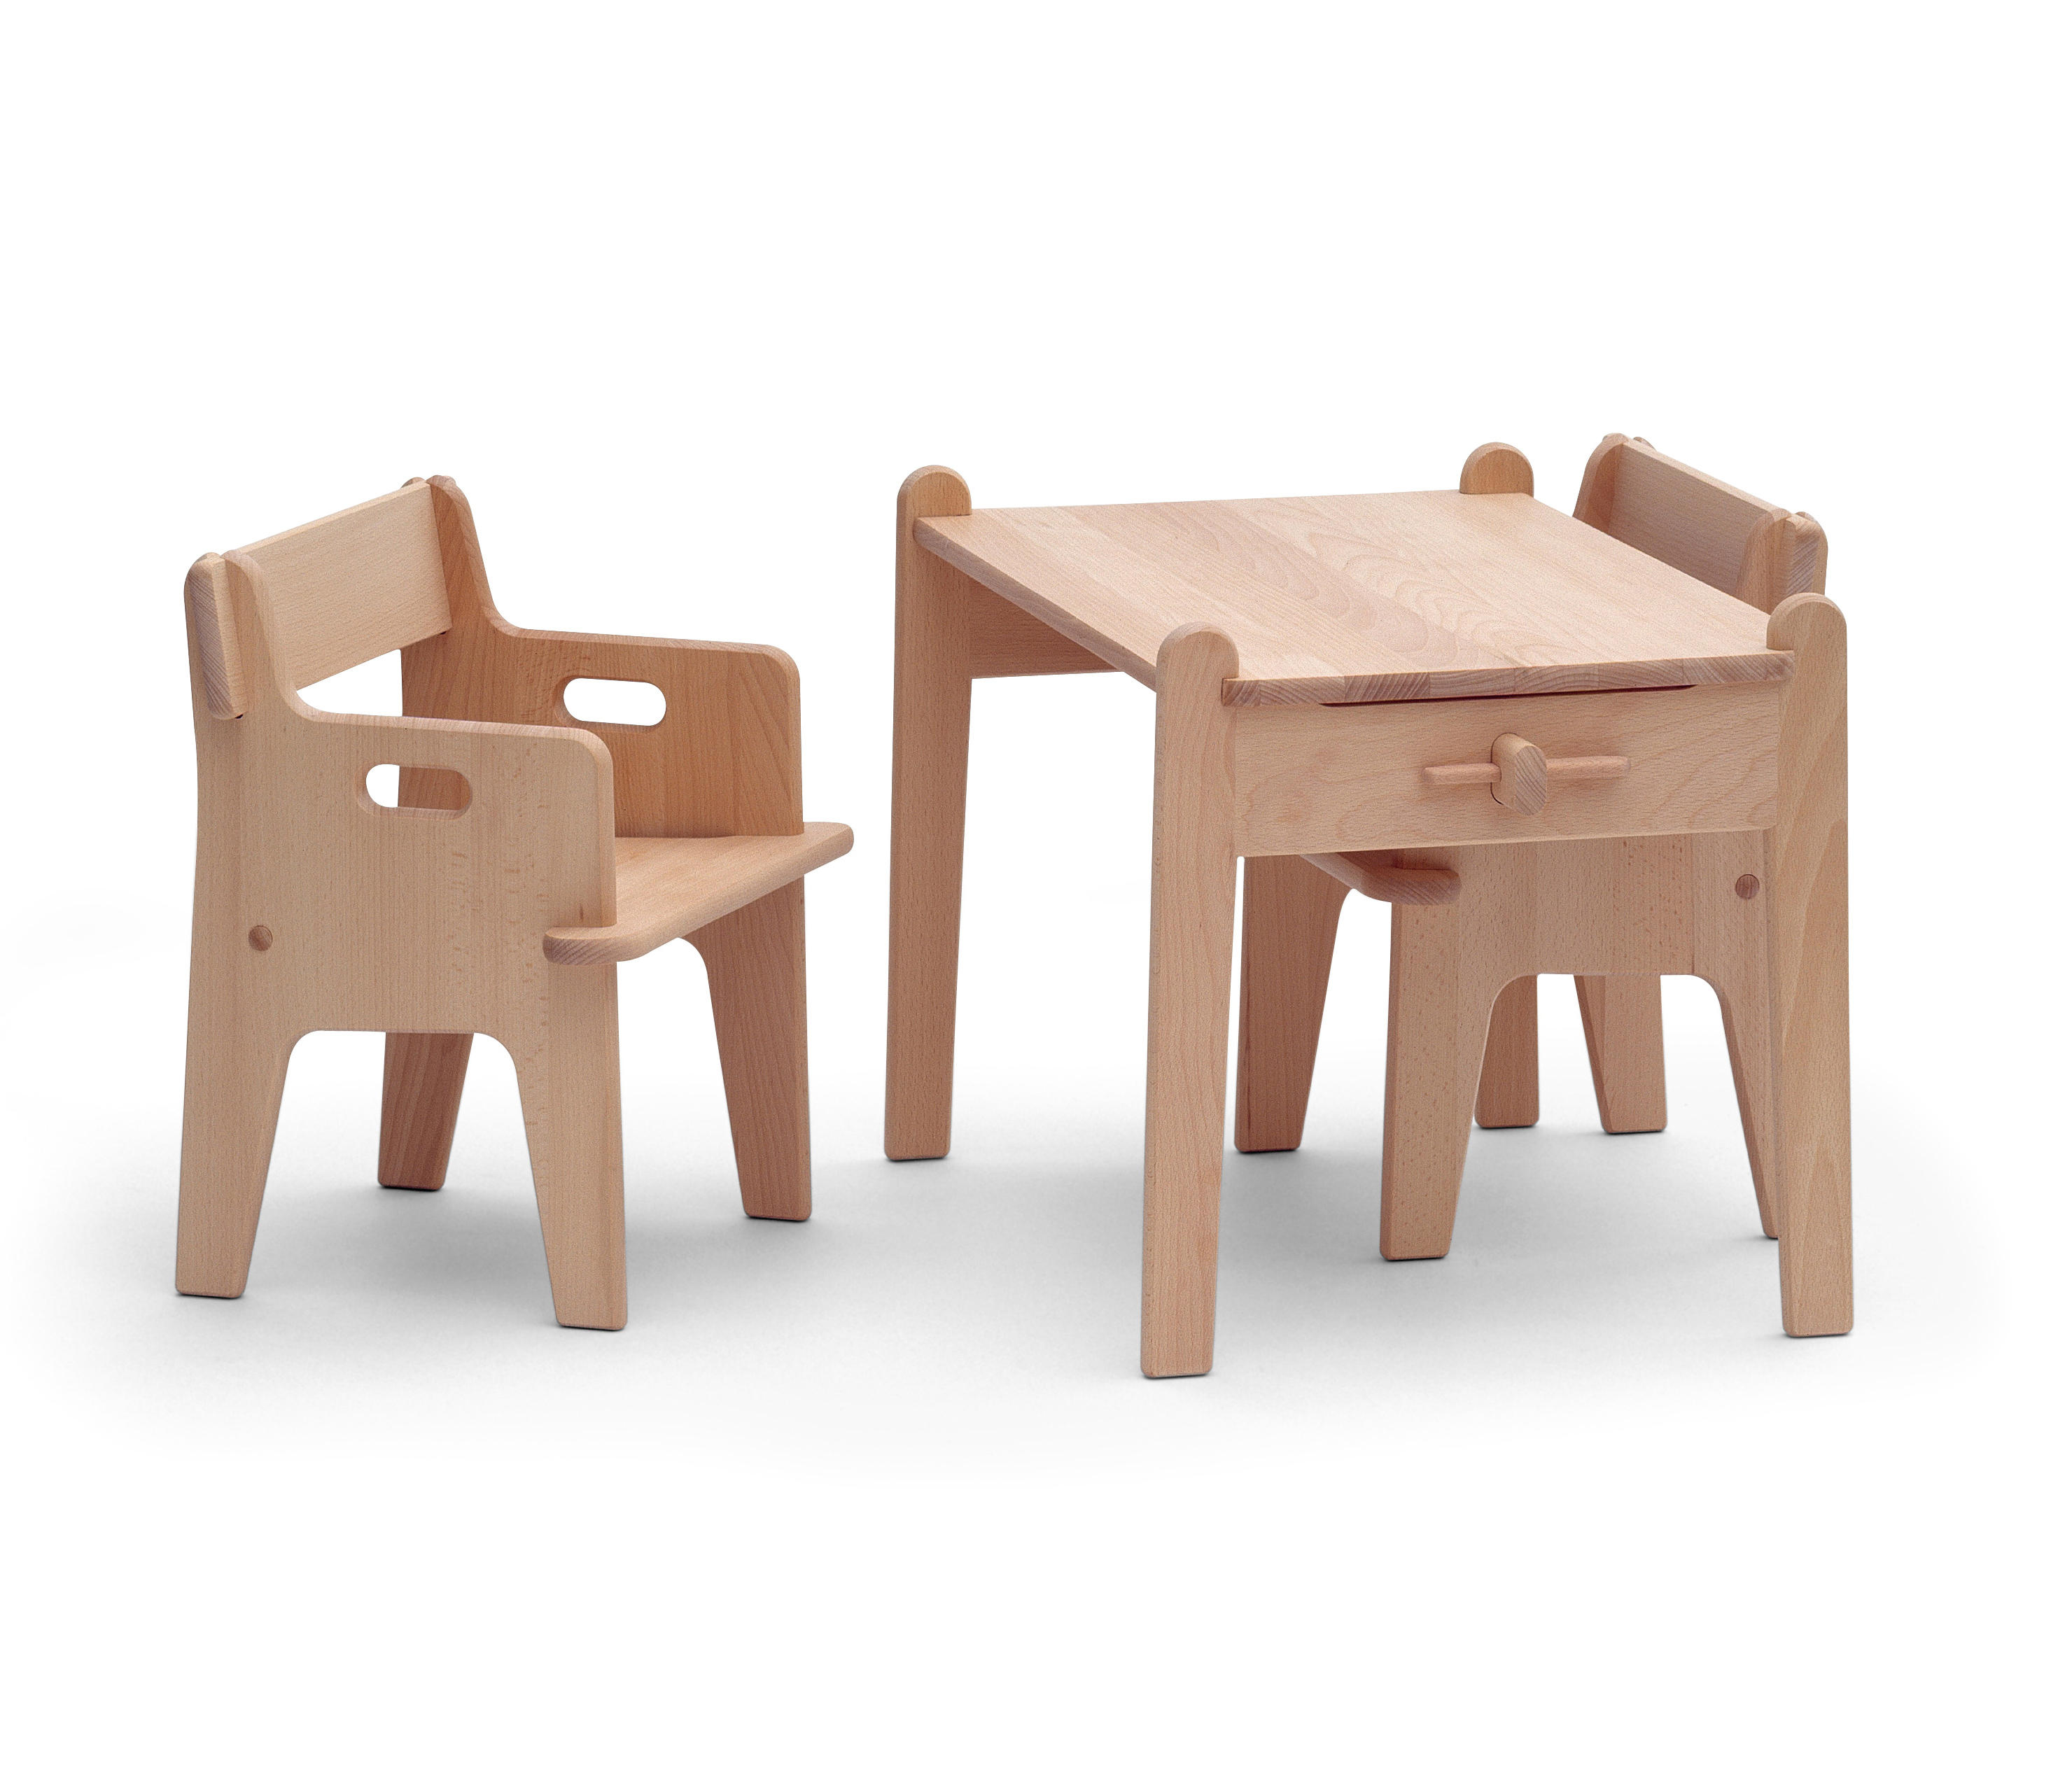 Ch410 by carl hansen søn kids chairs